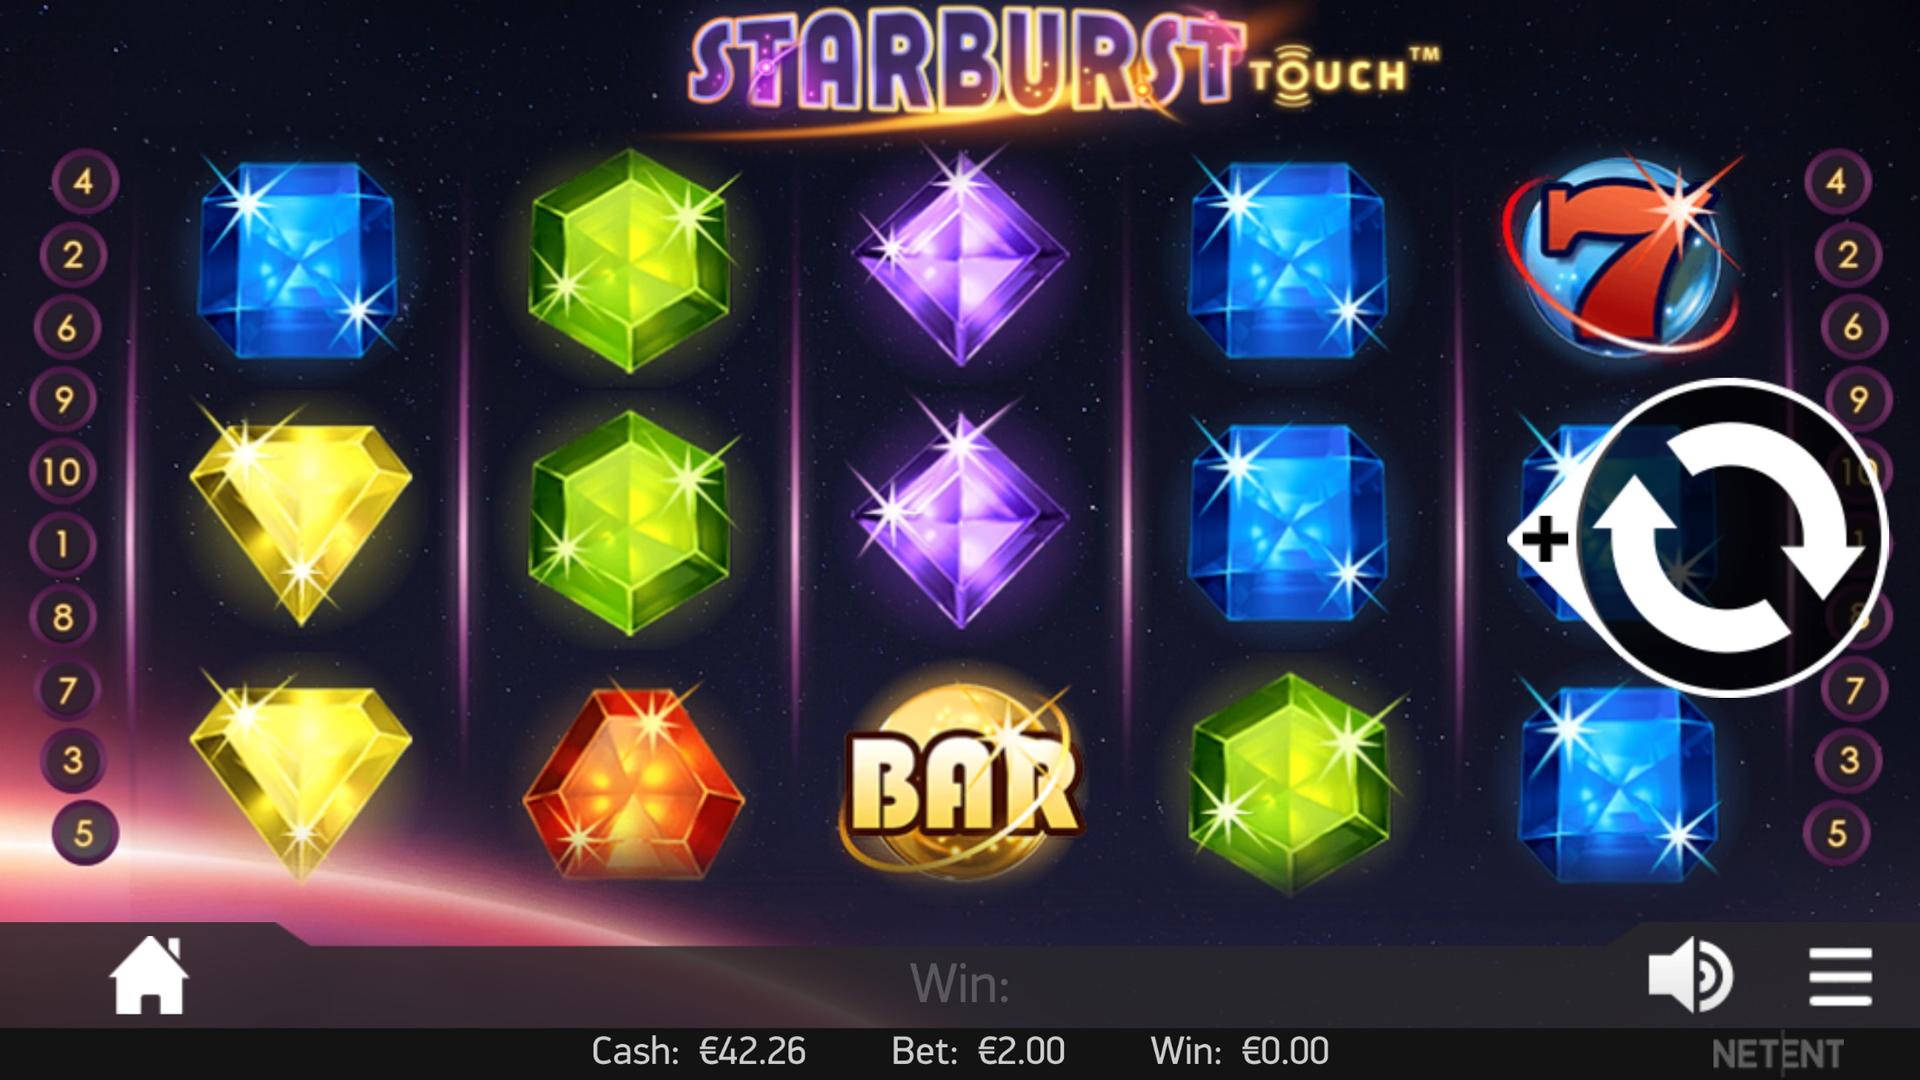 online casino ratgeber starbusrt